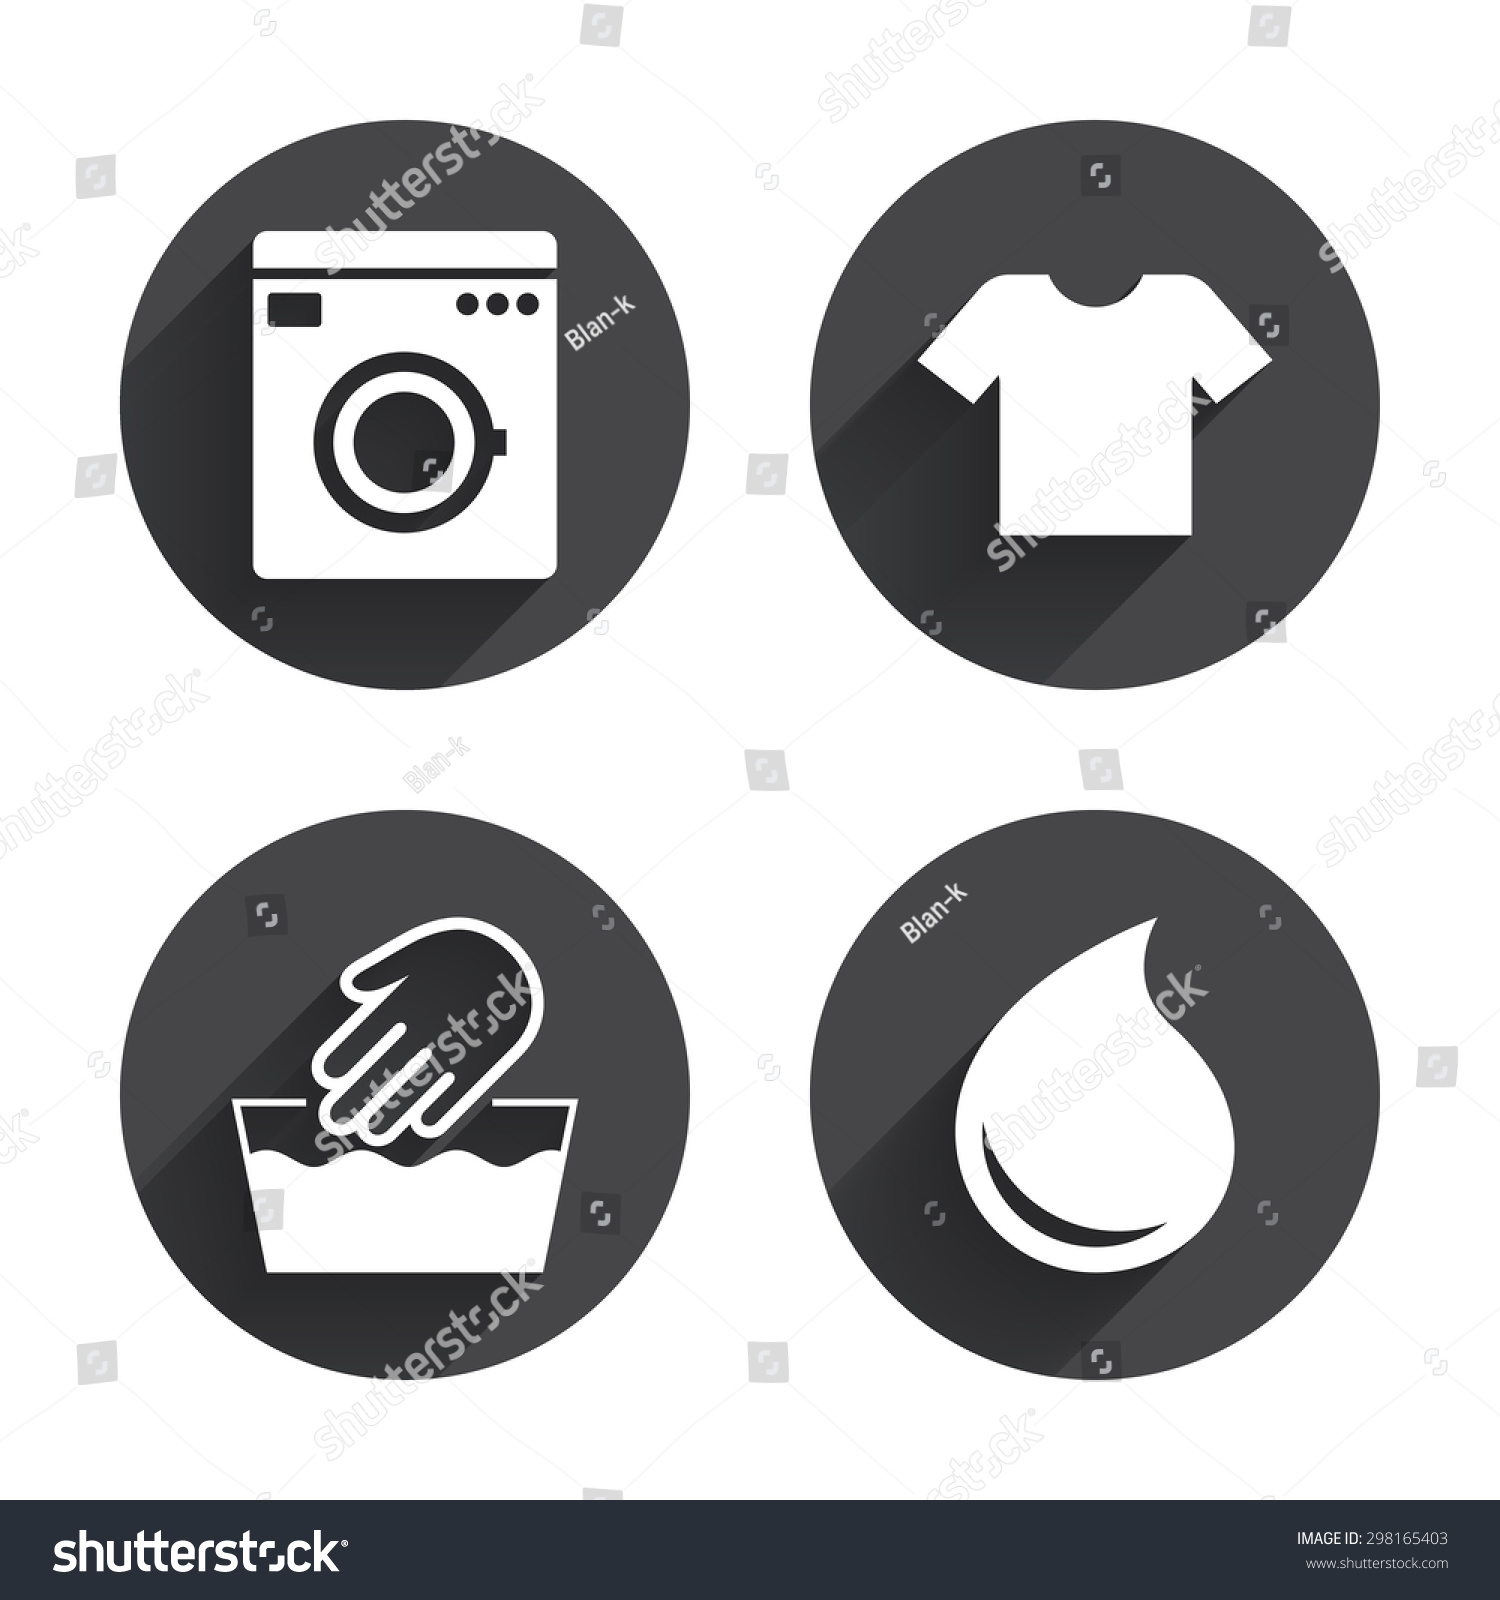 Wash machine icon hand wash tshirt stock vector 298165403 shutterstock wash machine icon hand wash t shirt clothes symbol laundry washhouse and buycottarizona Image collections